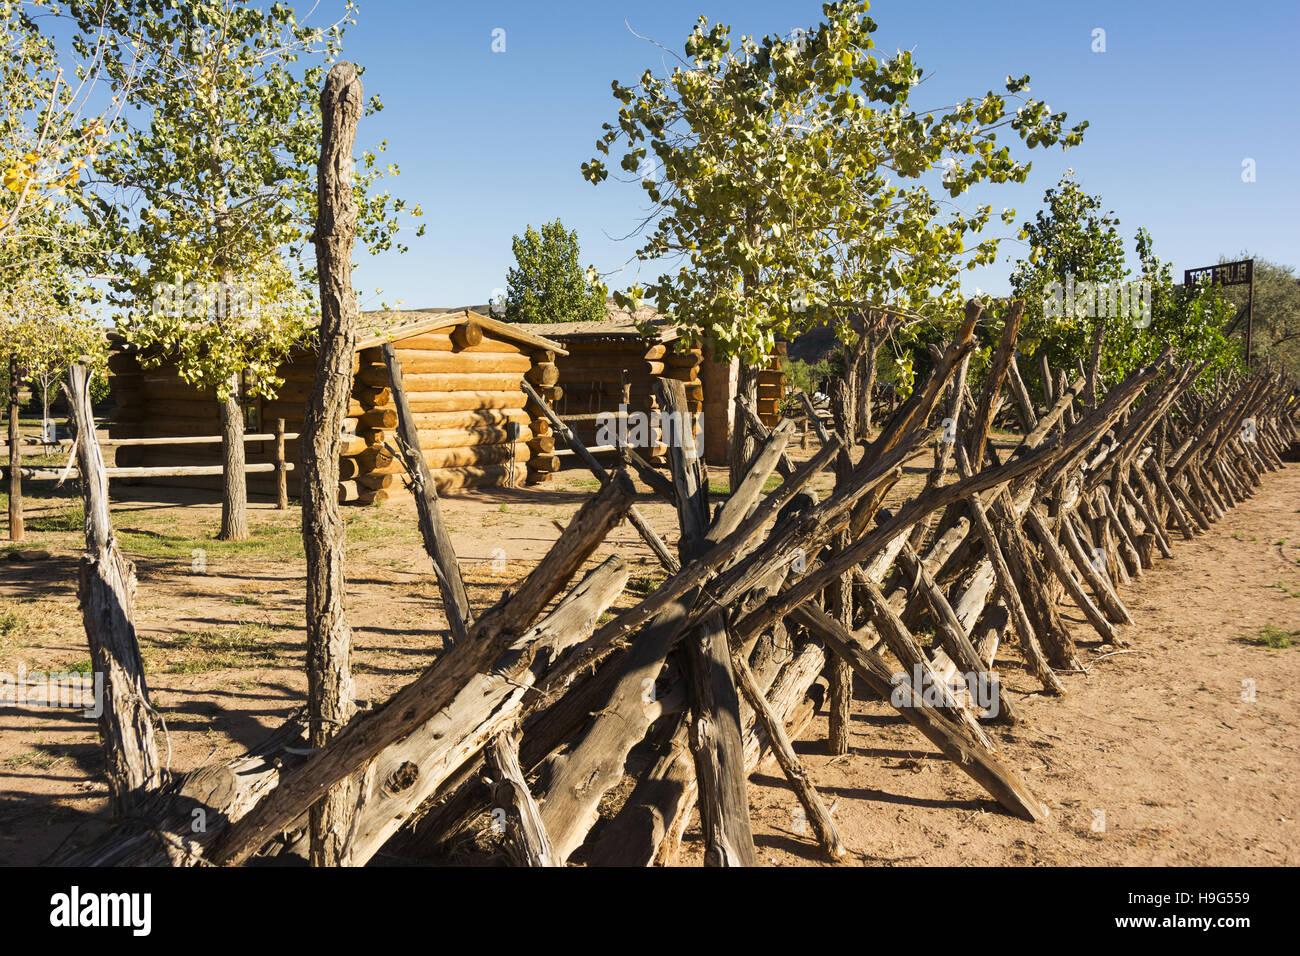 Utah, Bluff, Bluff Fort Historic Site - Stock Image